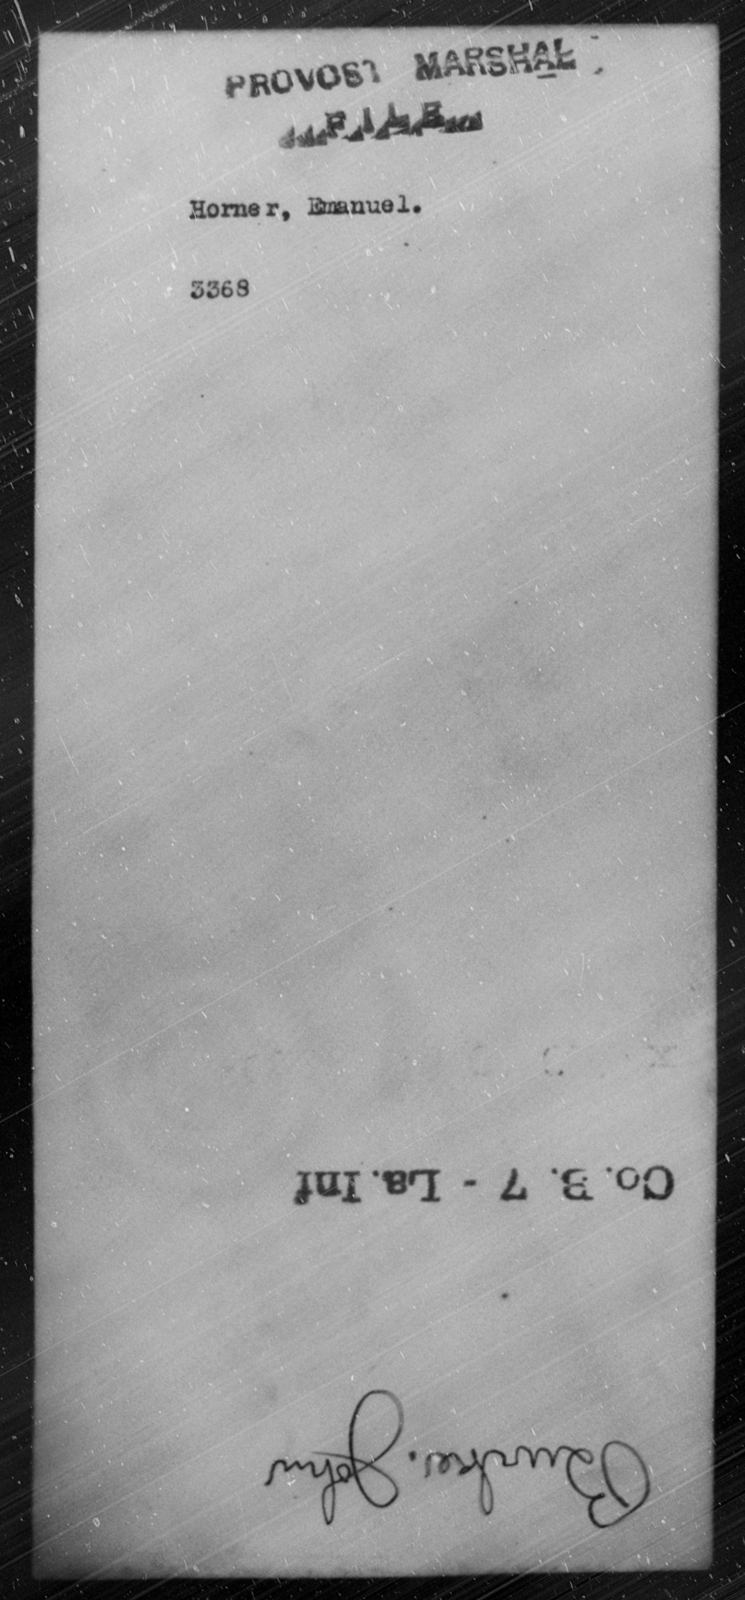 Horner, Emanuel - State: [Blank] - Year: [Blank]